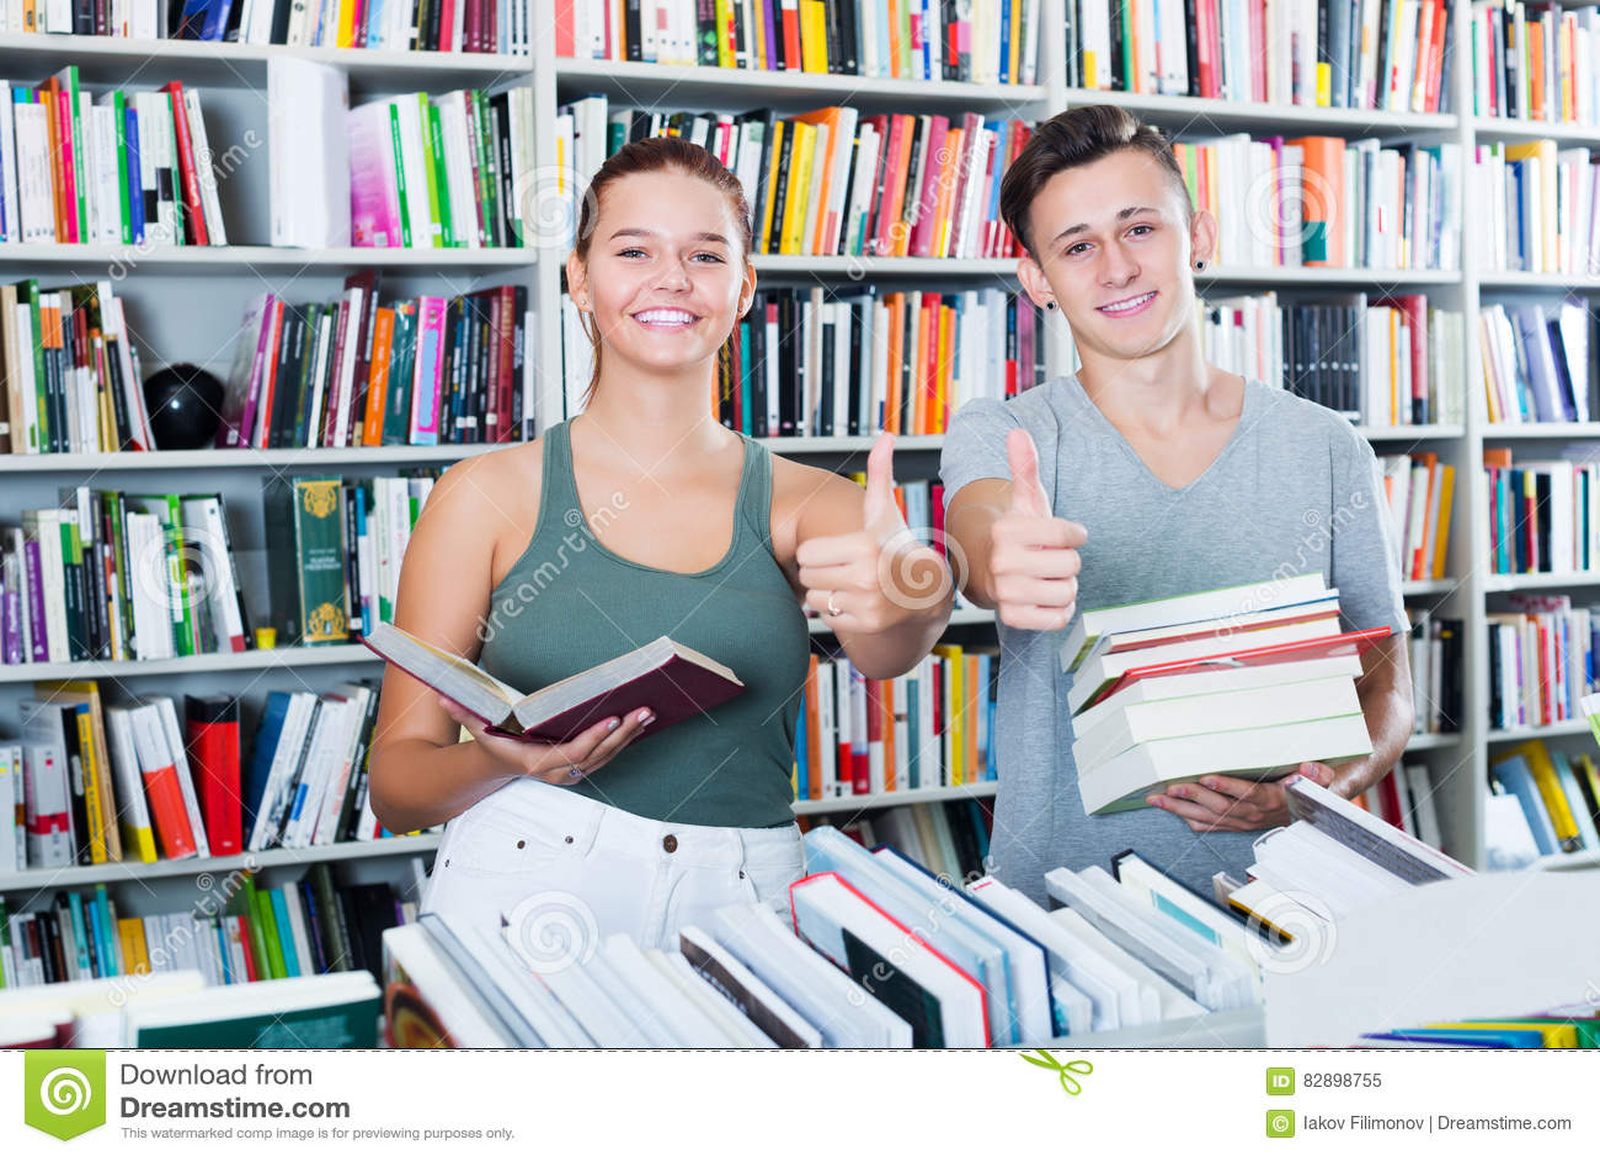 Ways To Start The New School Semester Off Right   GoEnnounce